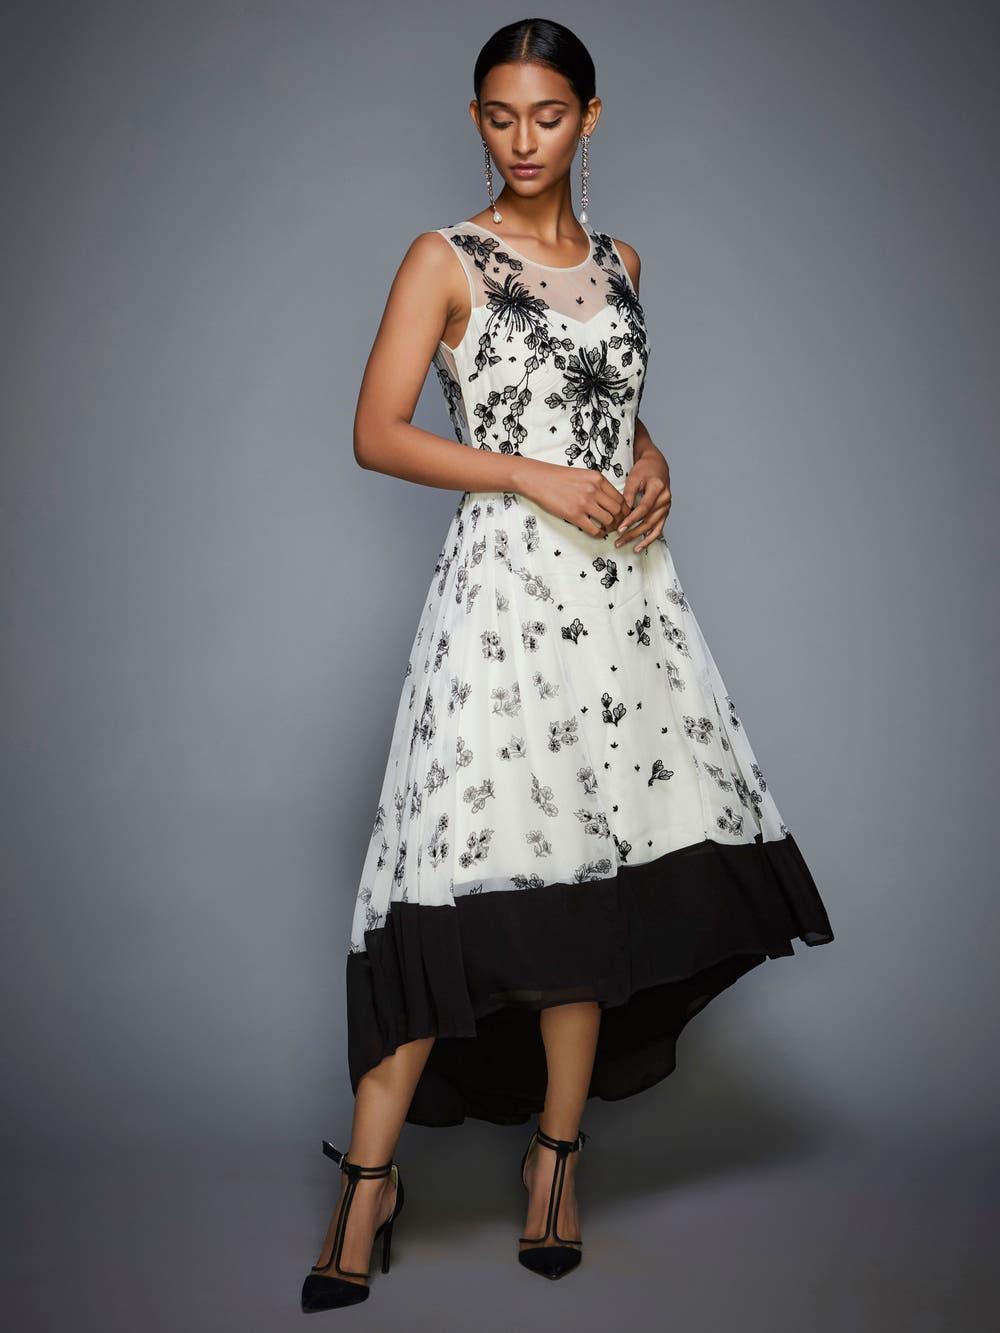 Ivory & Black Floral Asymmetric Dress